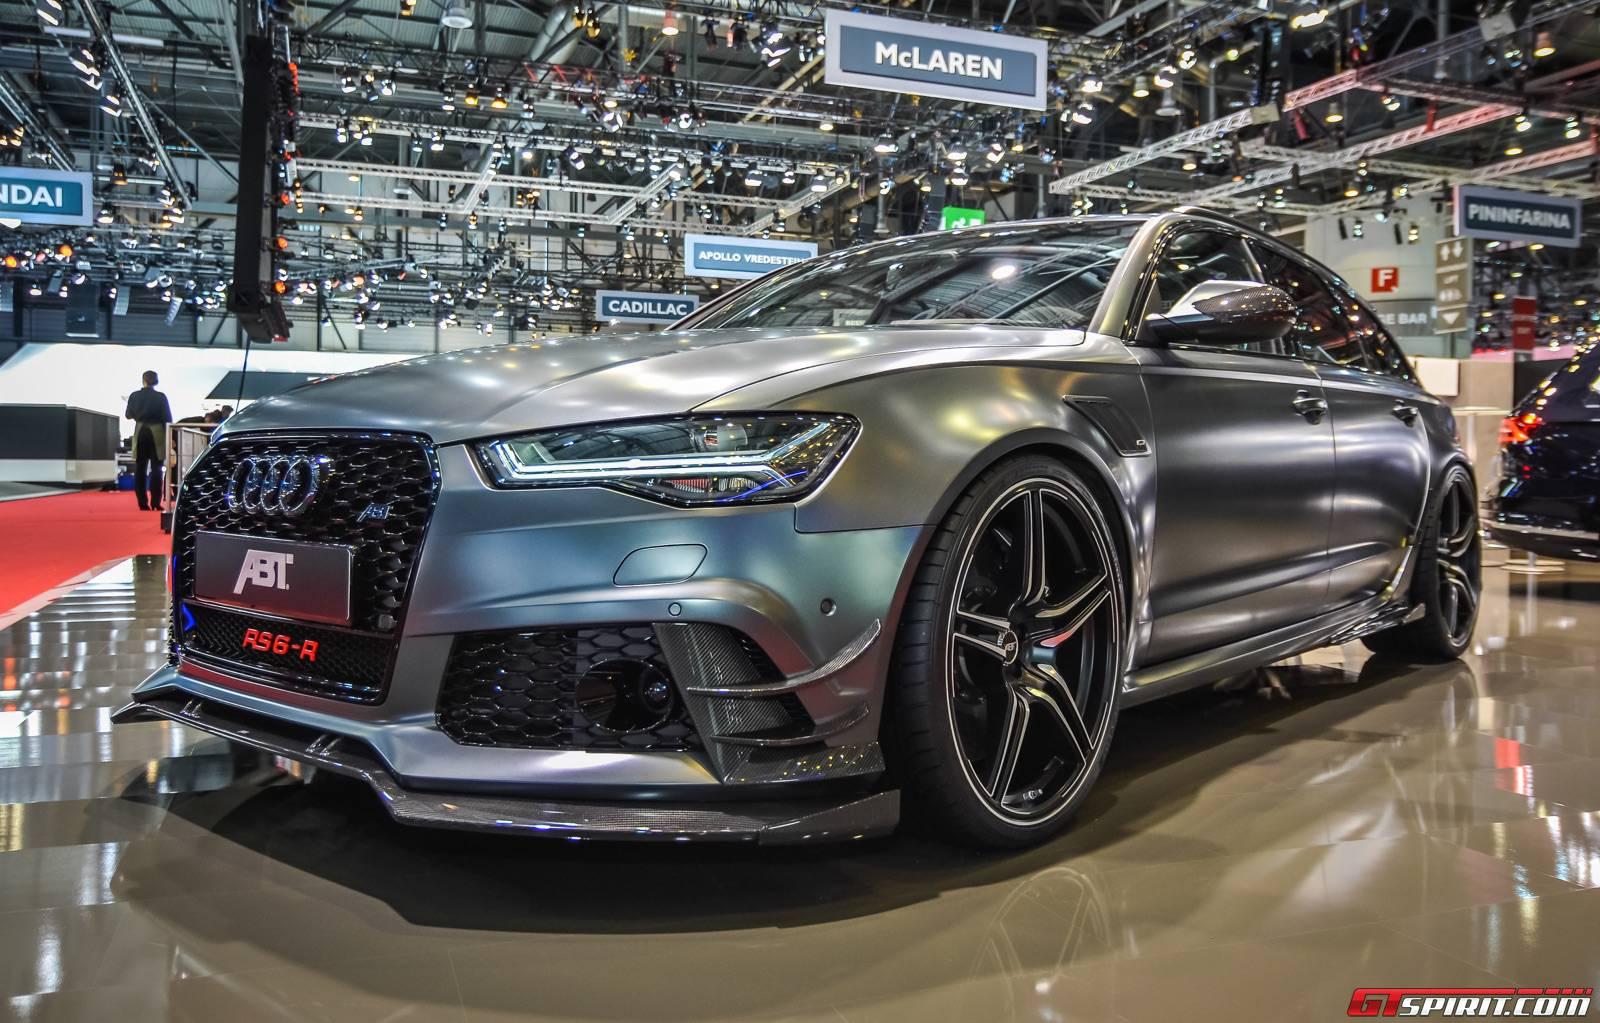 Geneva 2015 abt rs6 r gtspirit - Geneva car show ...